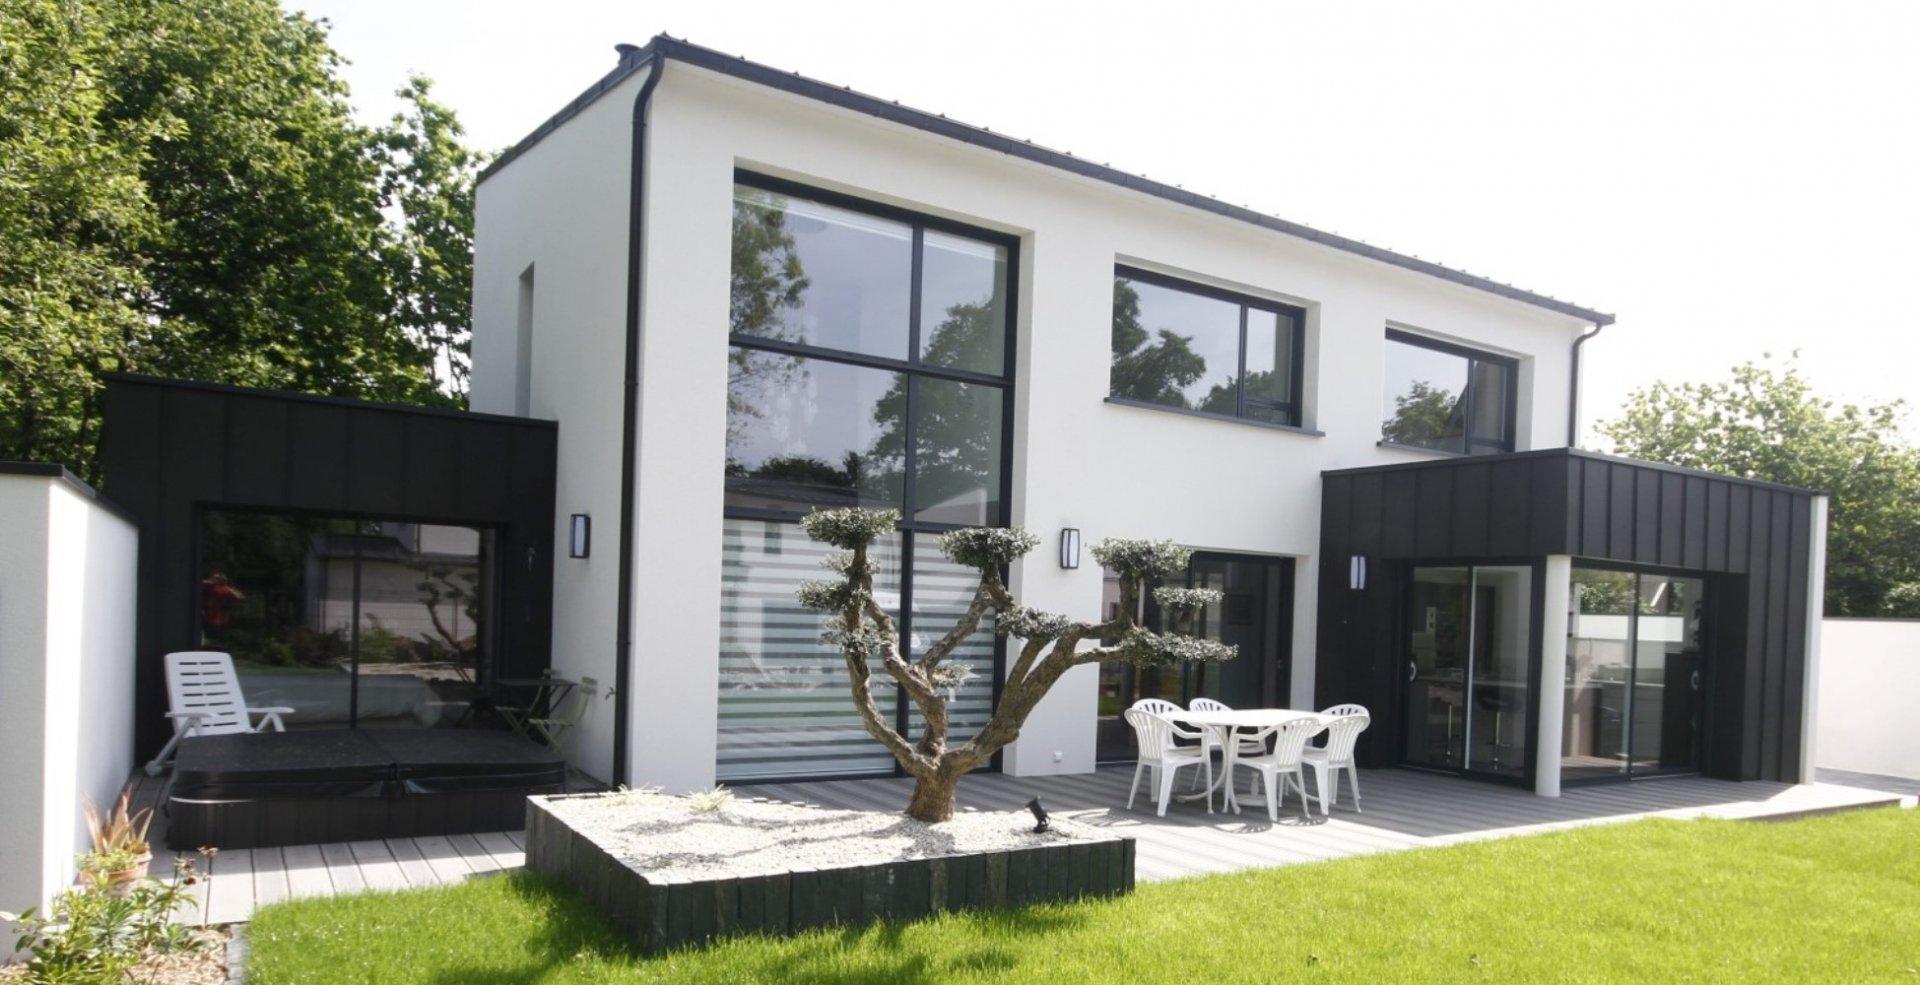 Cout faire construire sa maison good calculez par vous for Construire sa maison cout